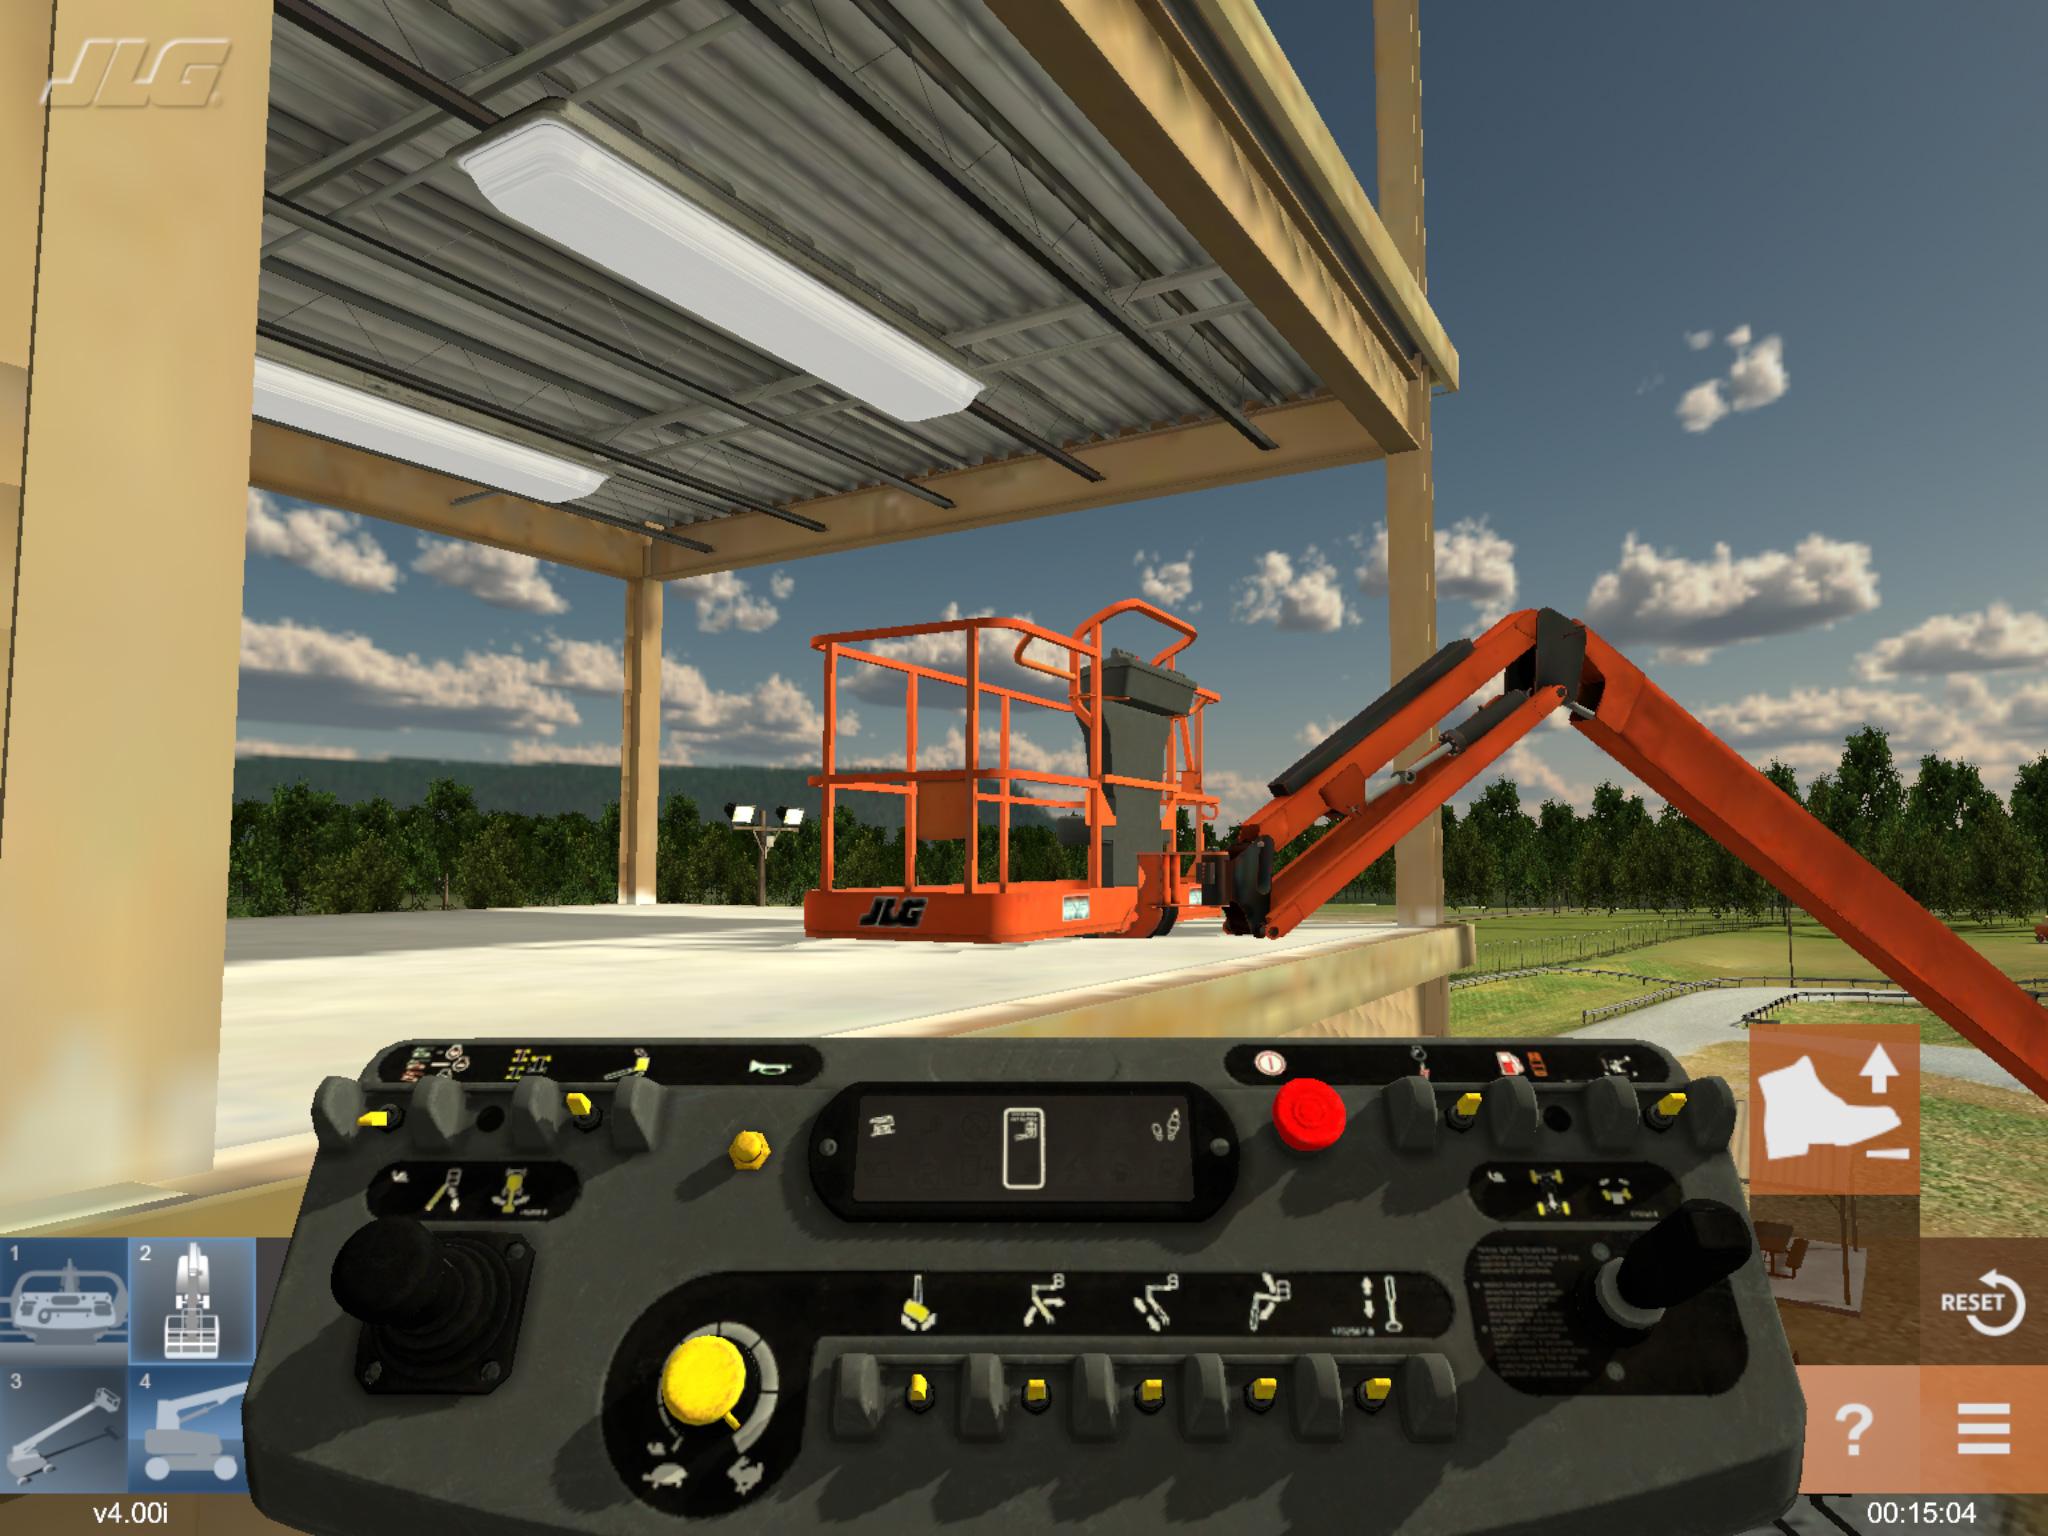 JLG Articulating Jib Lift Training Simulator by ForgeFX